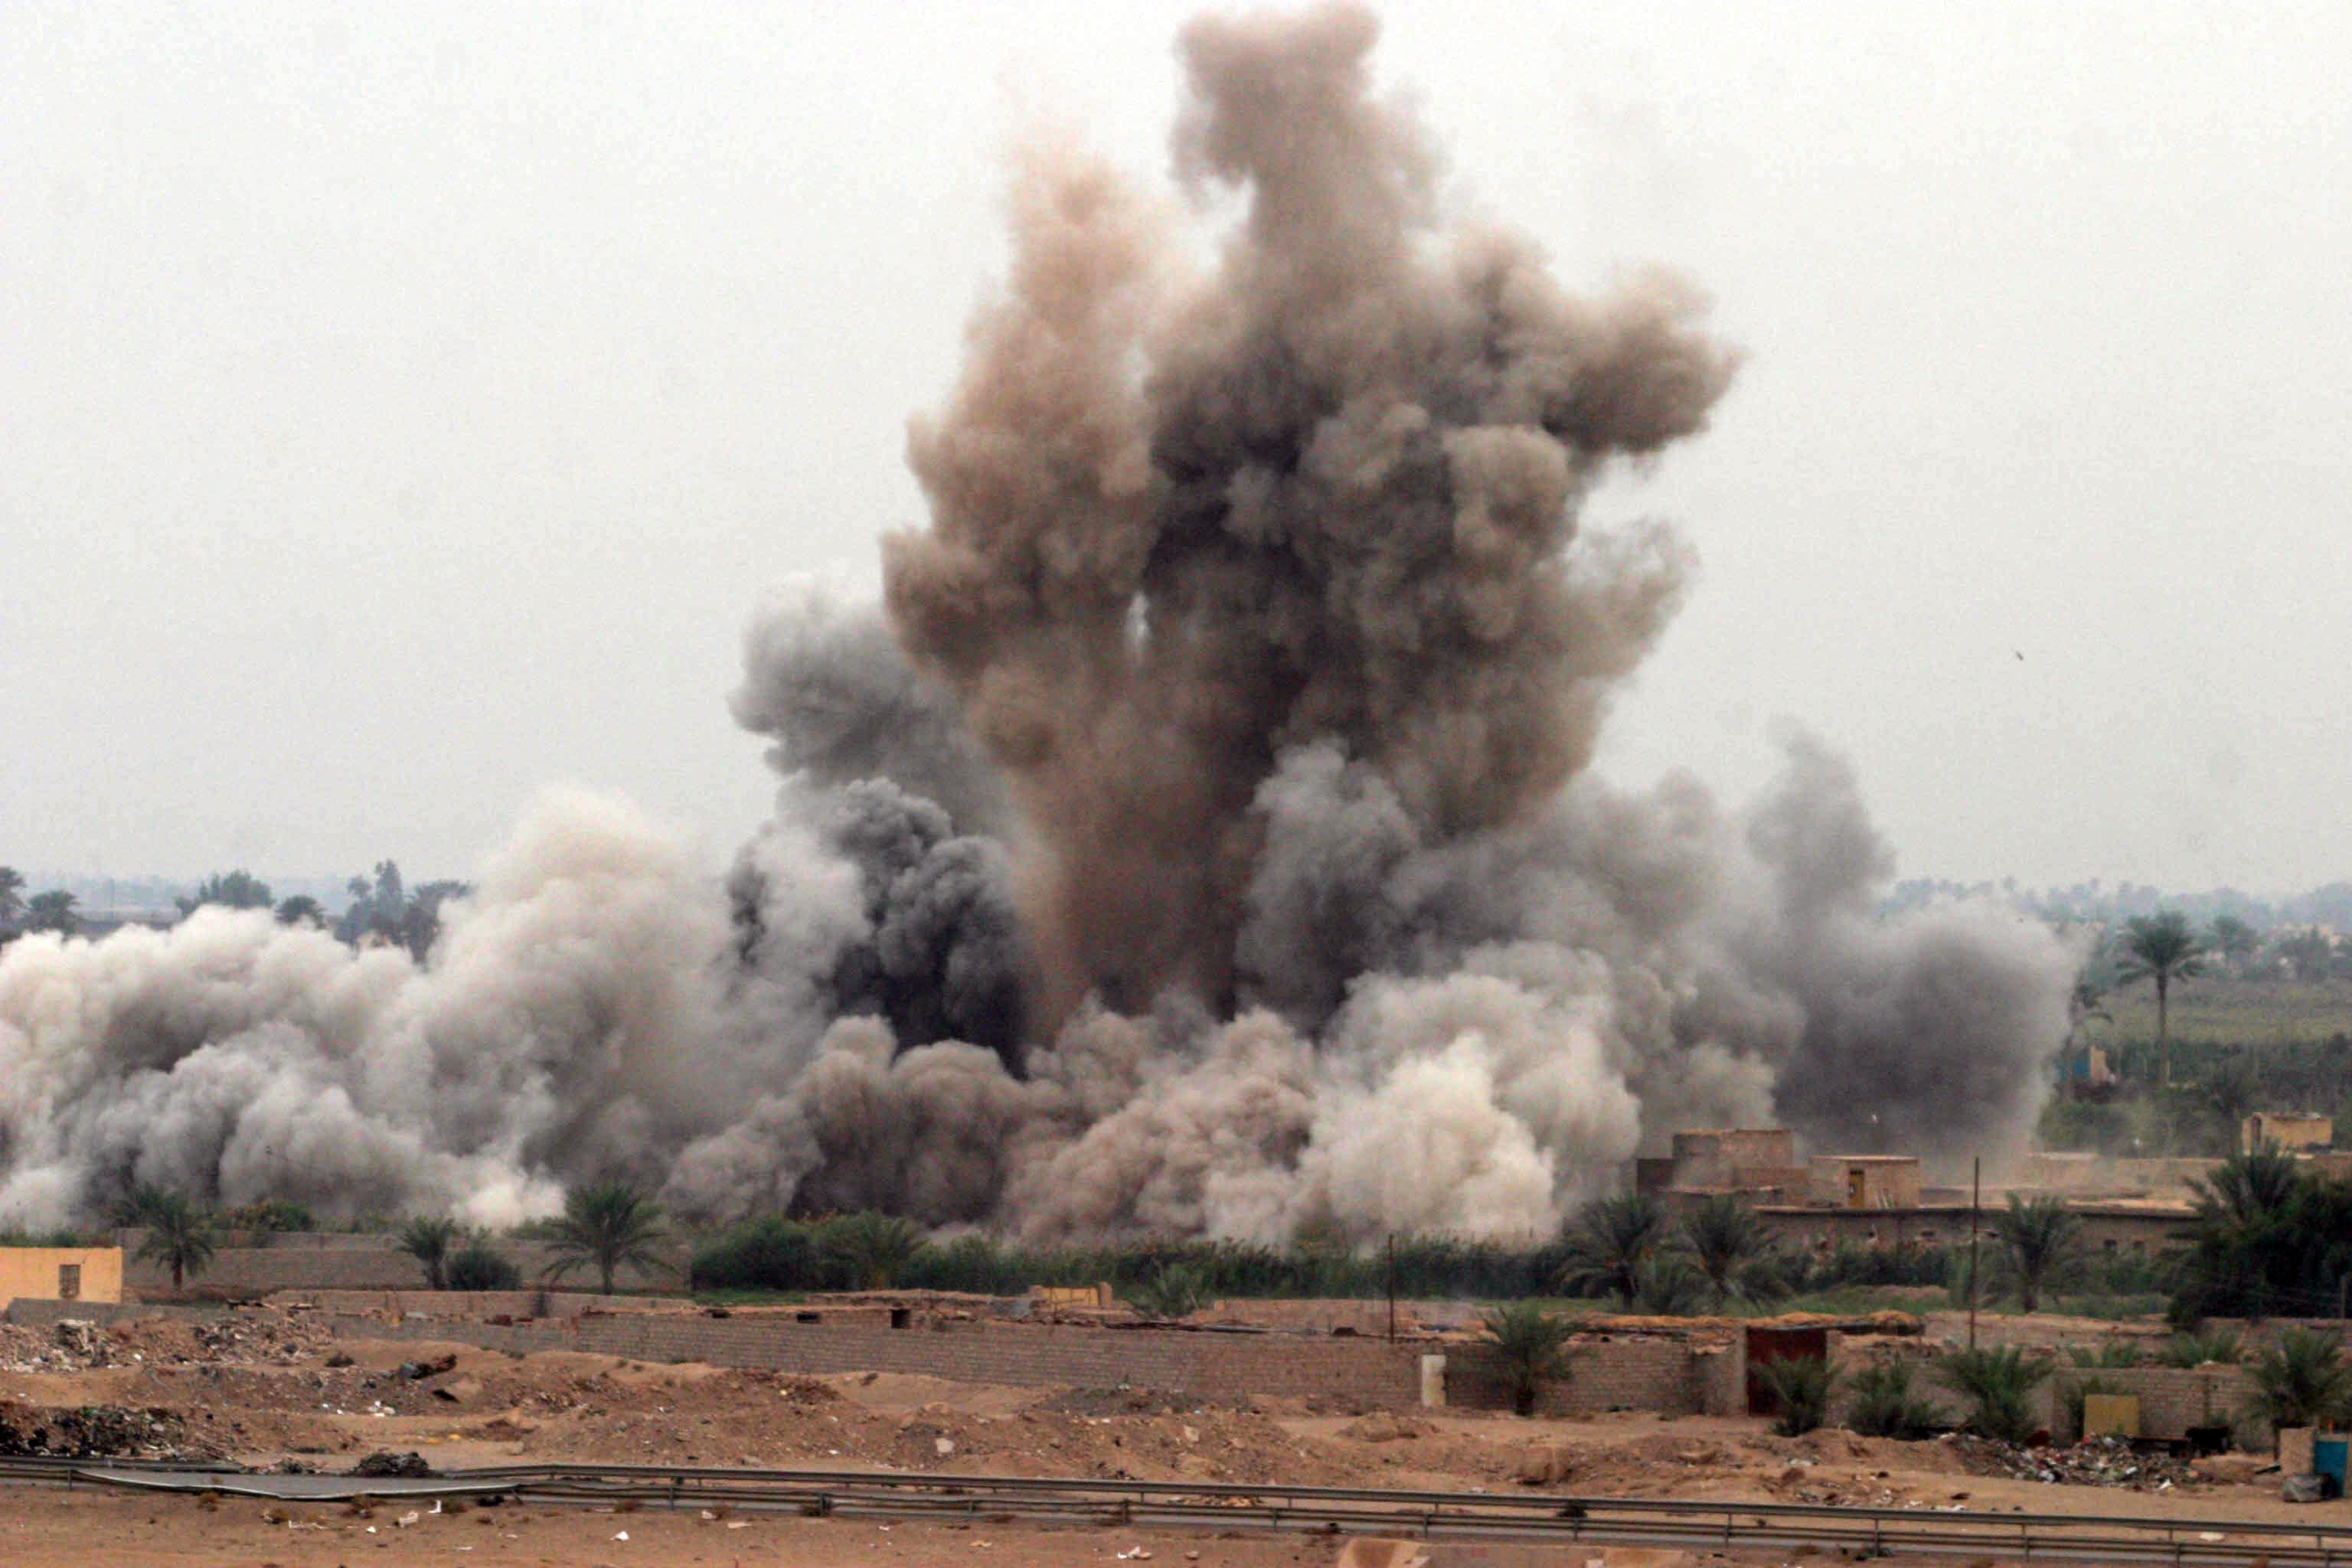 An air strike in Iraq during the Second Battle of Fallujah, Nov. 8, 2004. (Wikimedia)